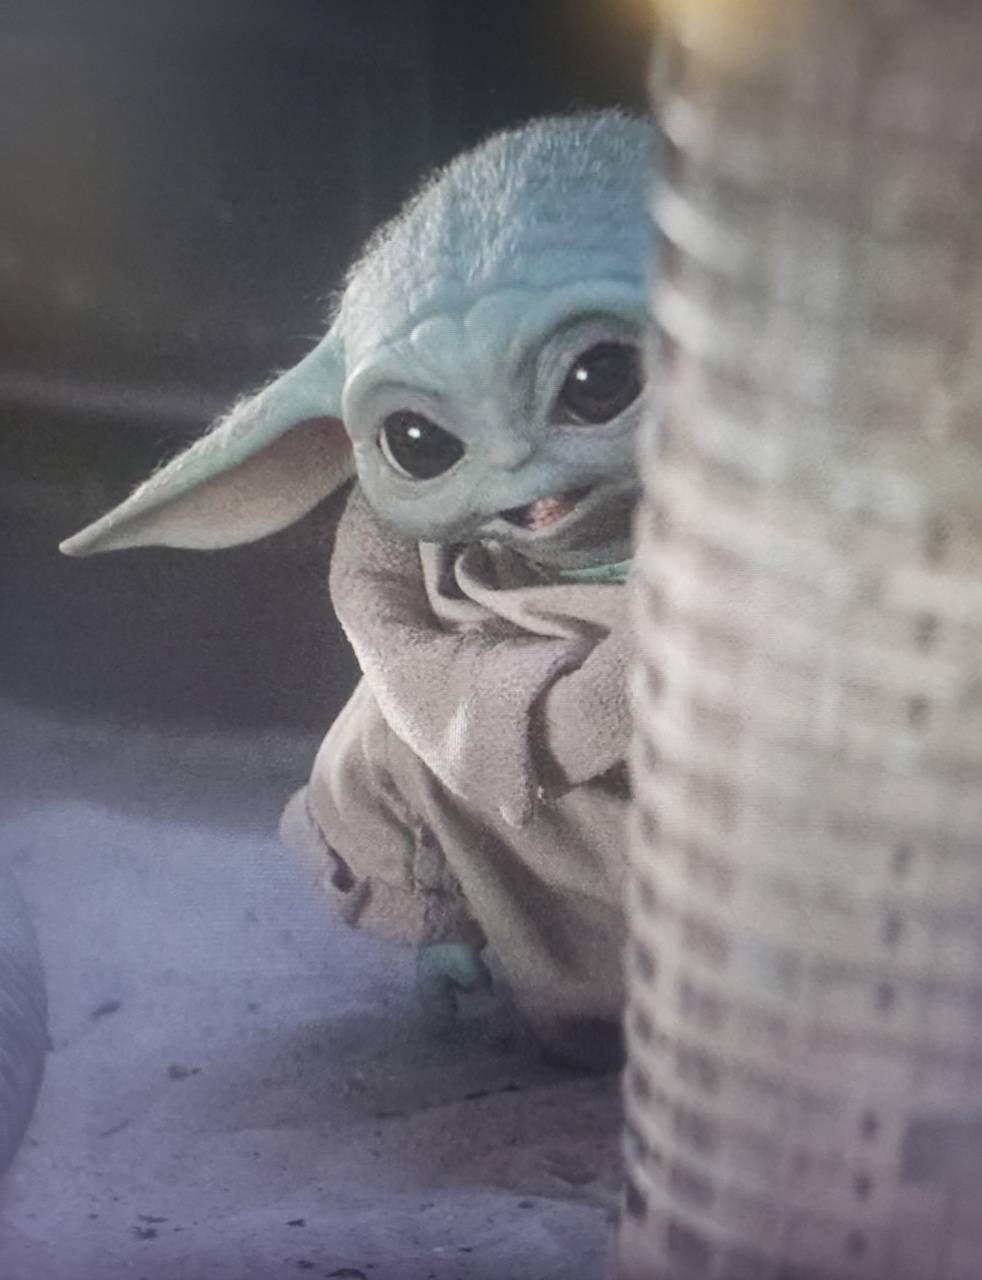 Baby Yoda Wallpaper By Yoda Wallpaper Yoda Images Star Wars Baby